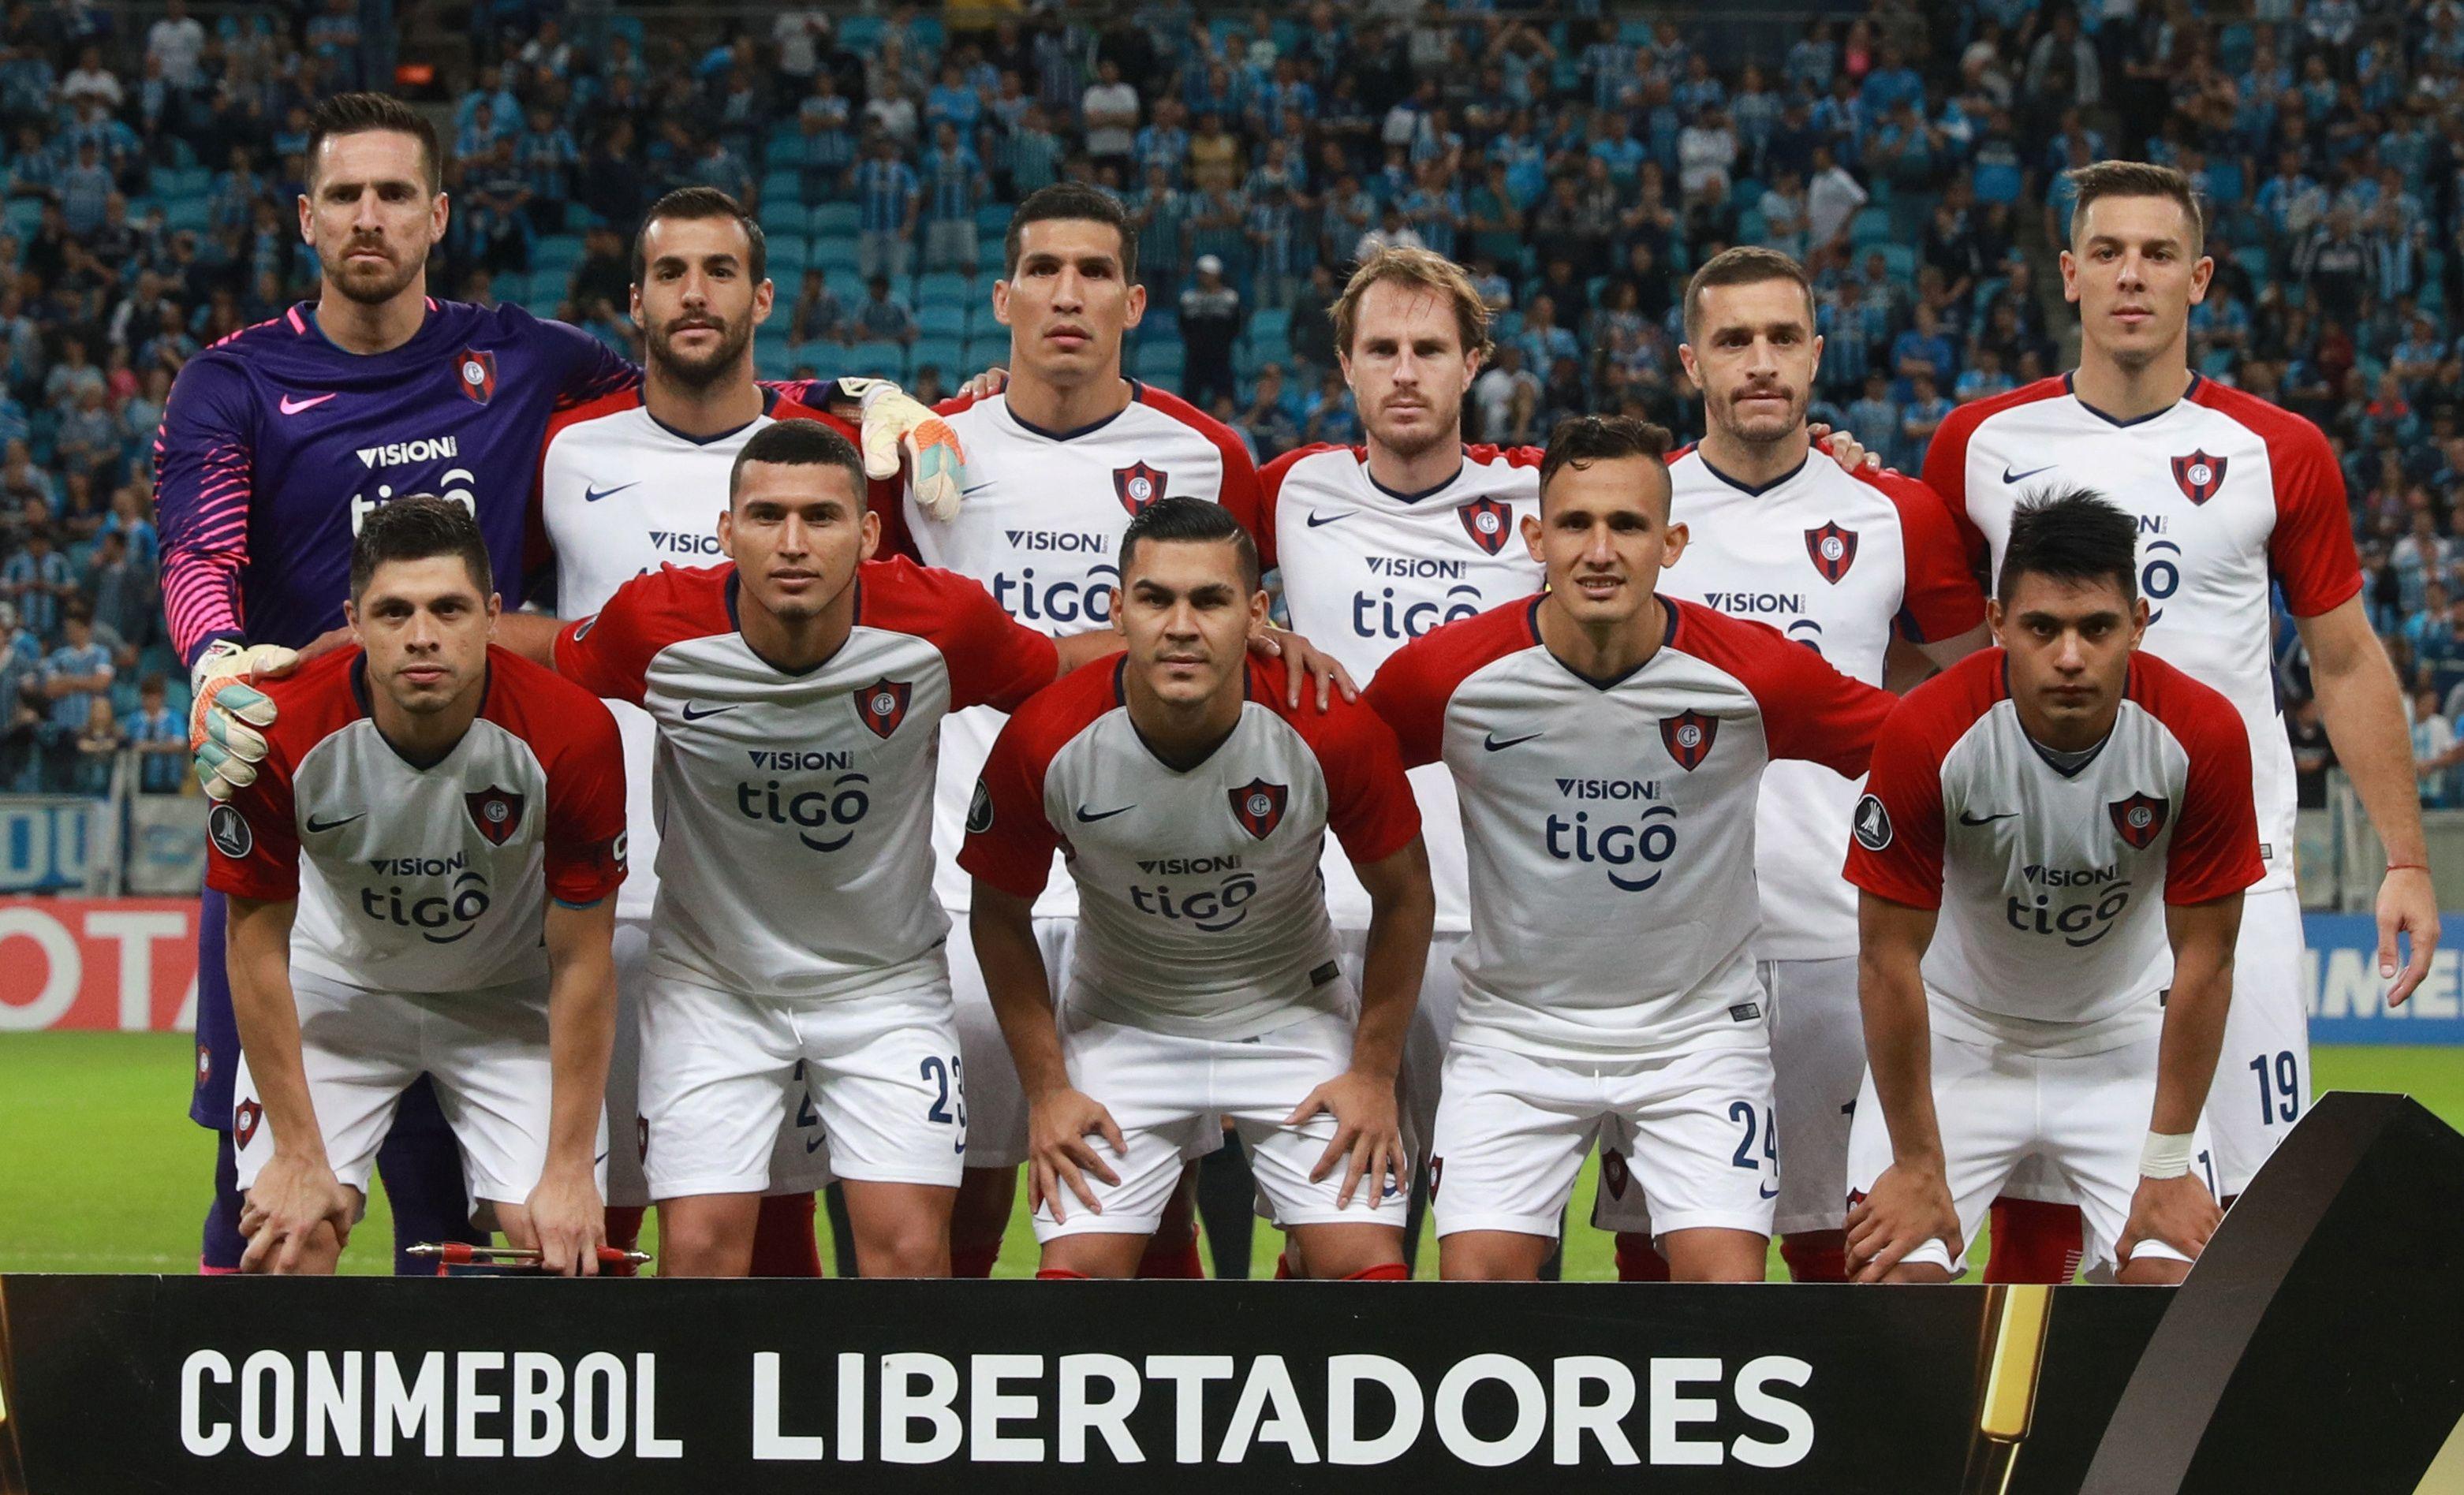 Cerro no pudo y cayó por 5-0. Foto: Goal.com